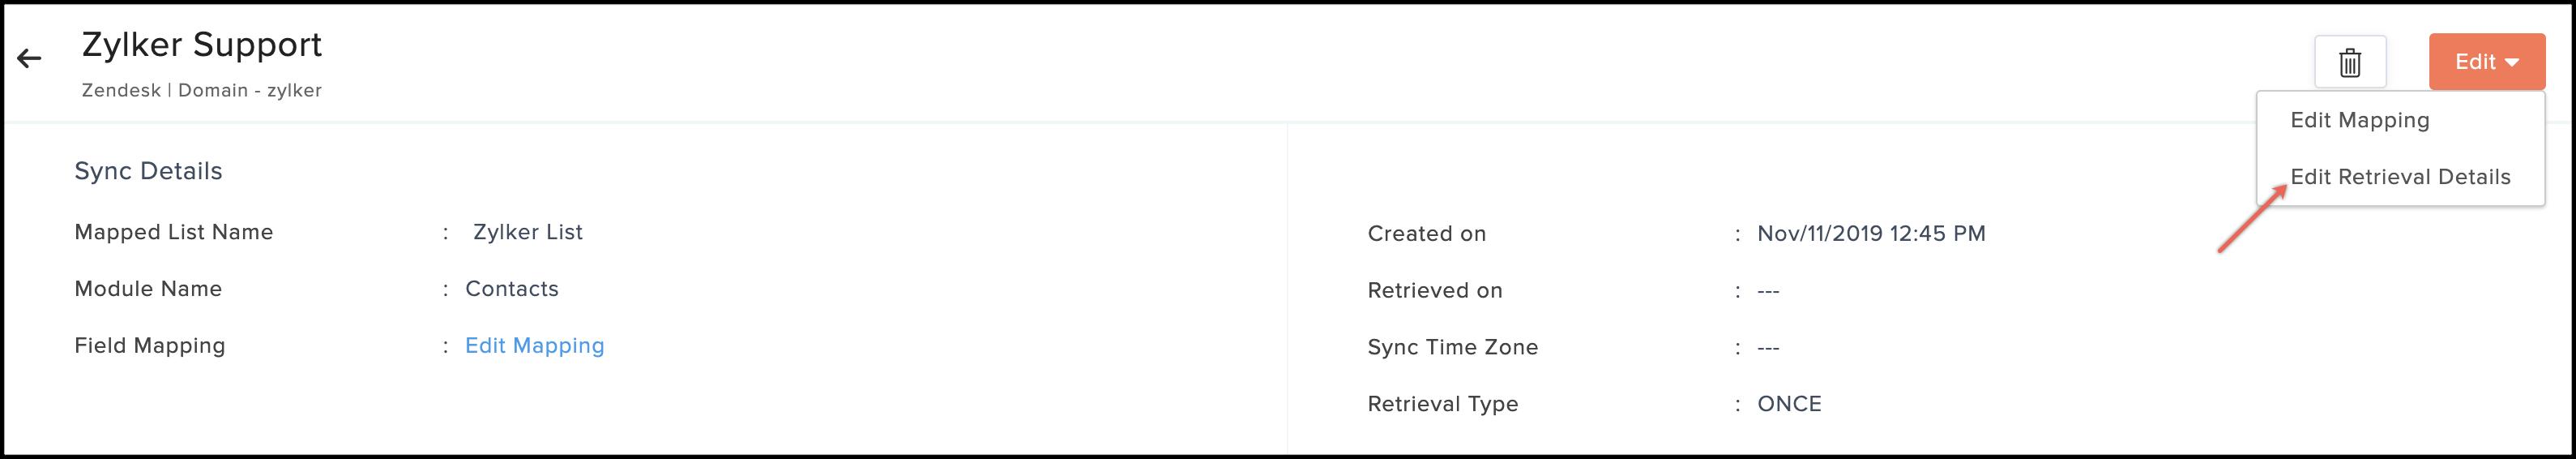 edit retrieval details